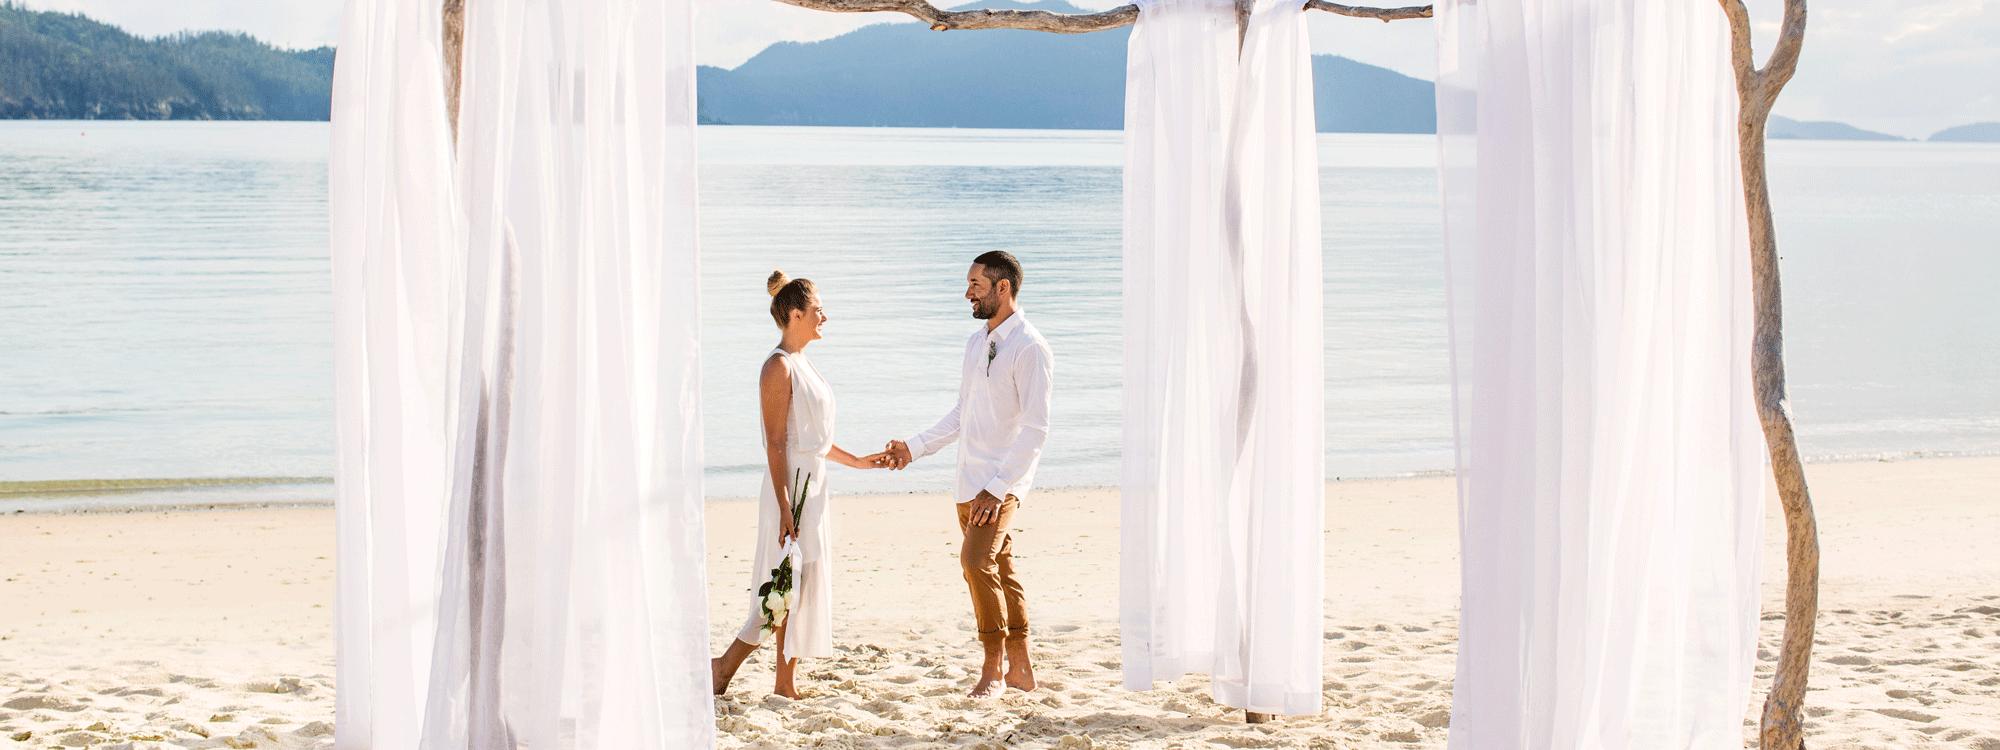 HI-Wedding_Catseye_rosenlund095